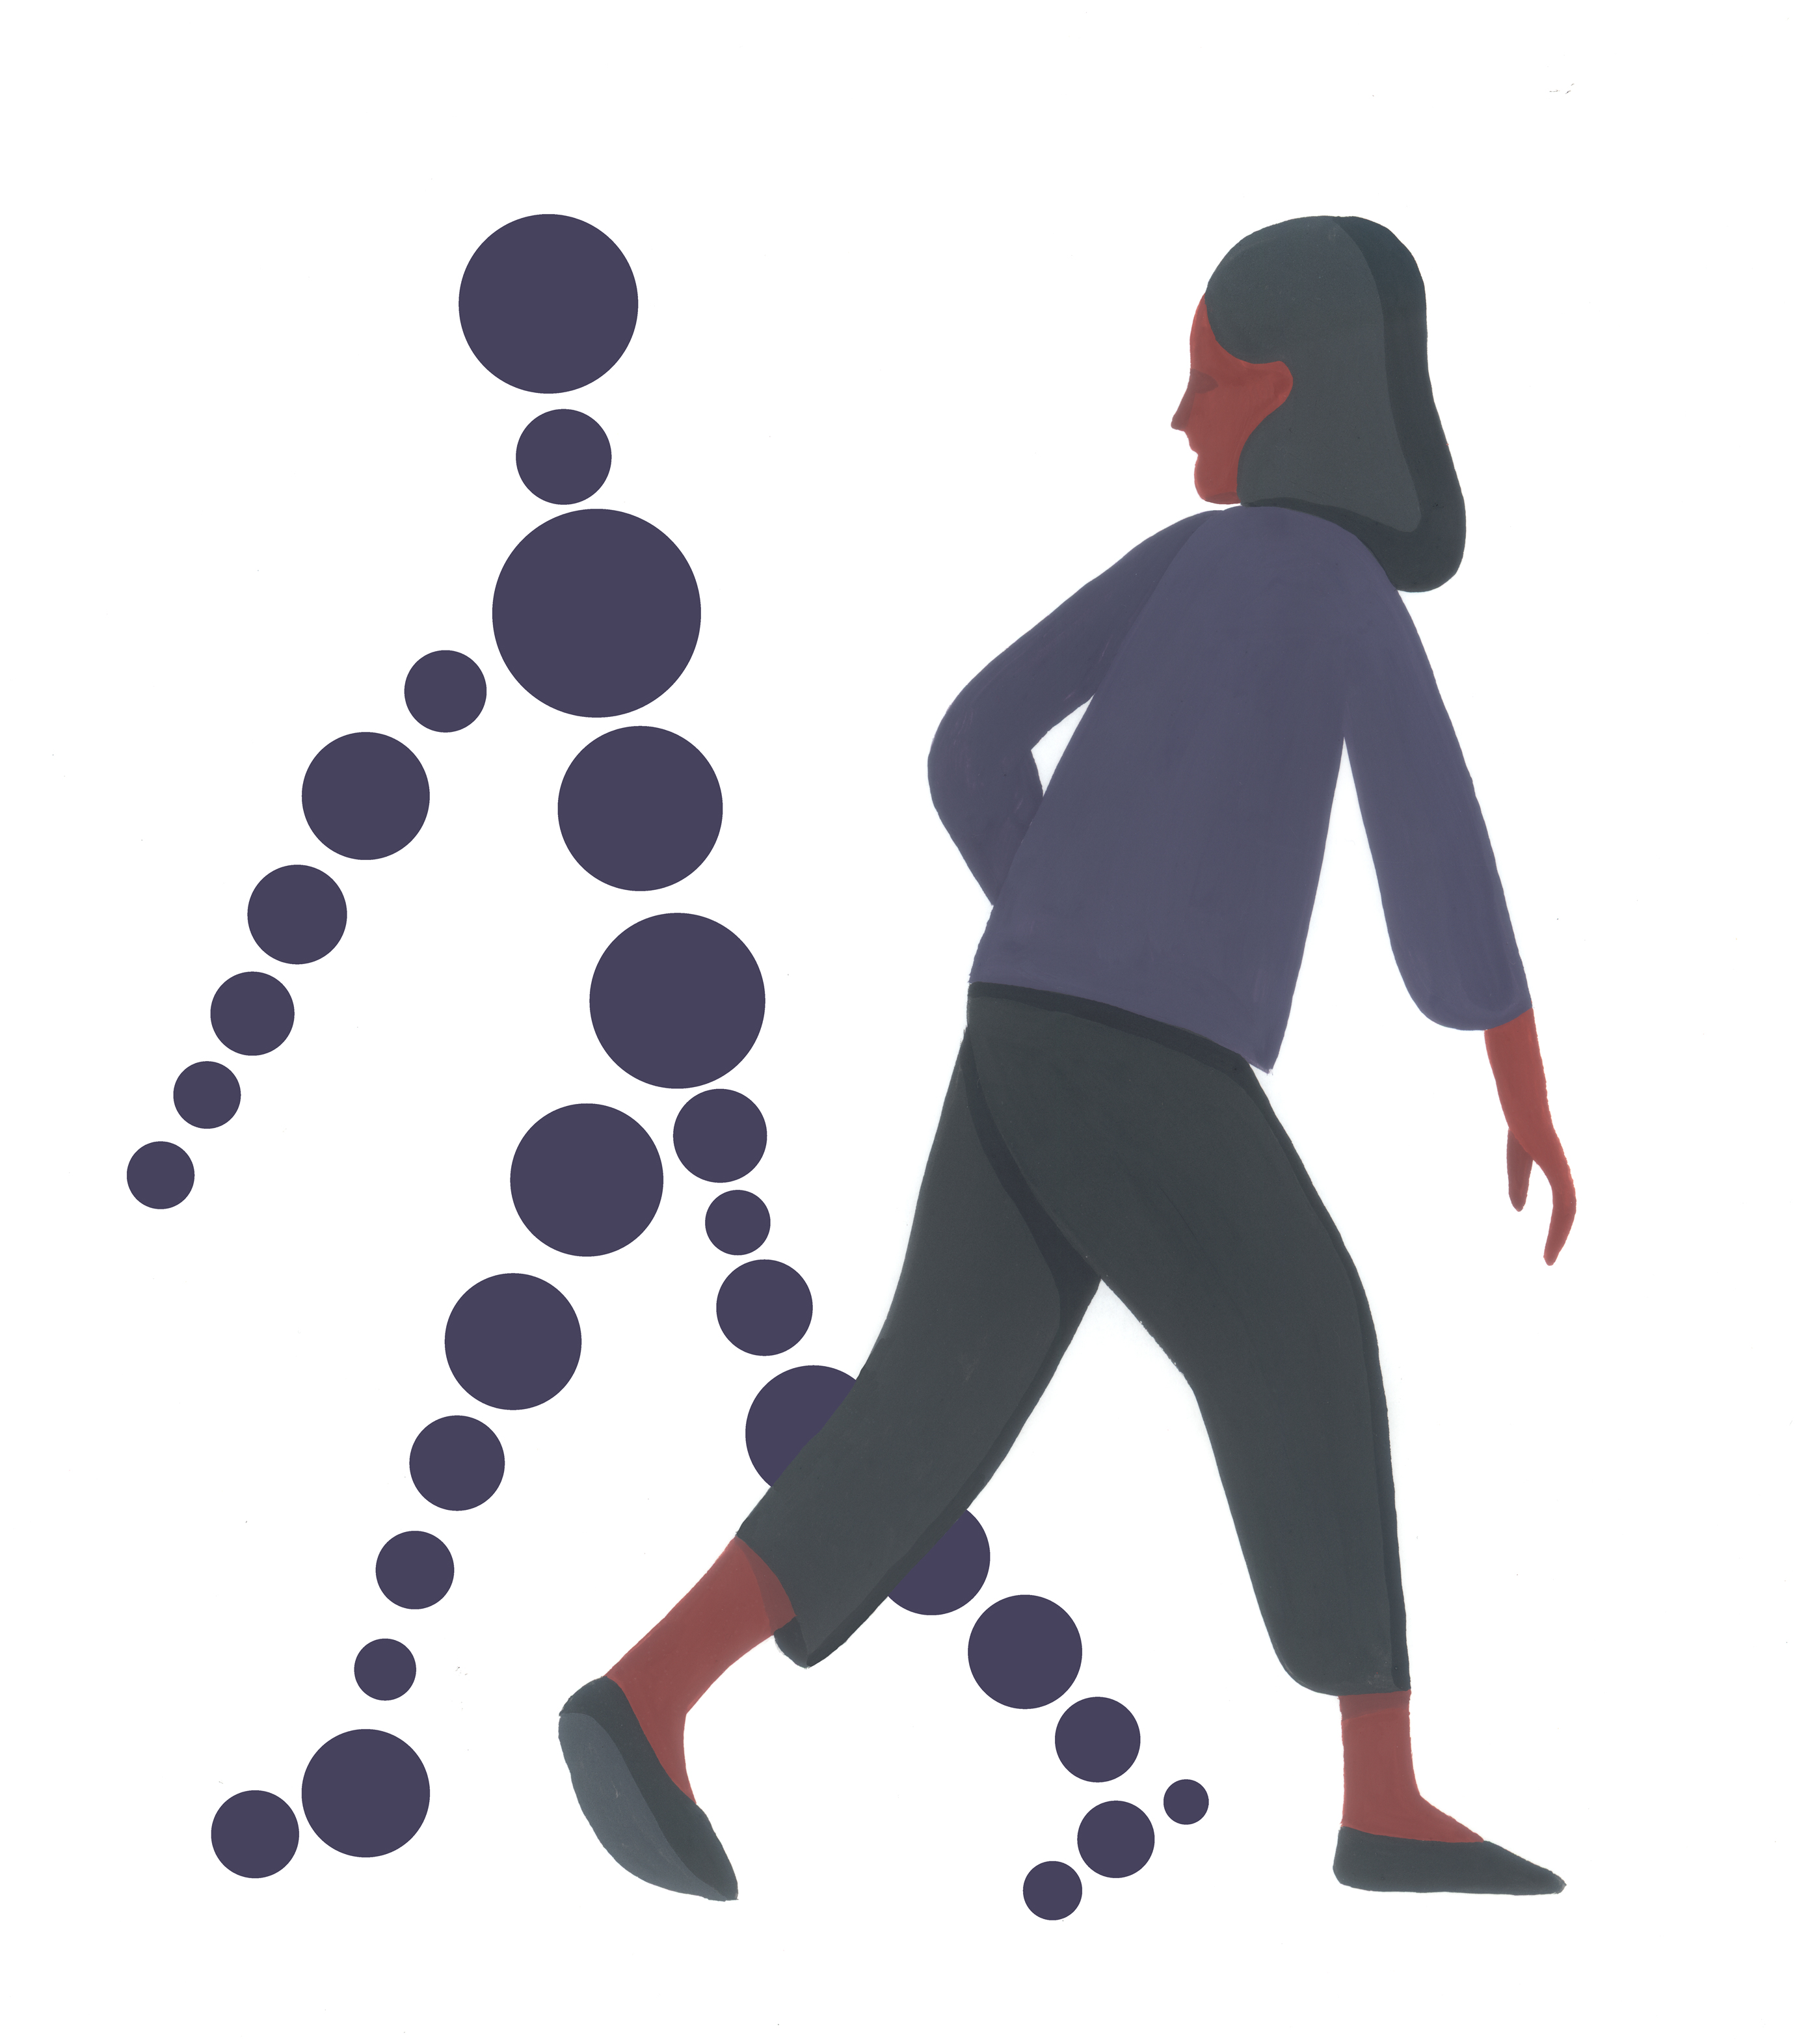 "<b> <a href=""https://www.technologyreview.com/s/609318/the-great-ai-paradox/""> La gran paradoja de la IA </a> </ b> <br> Ilustración de Geoff McFetridge"